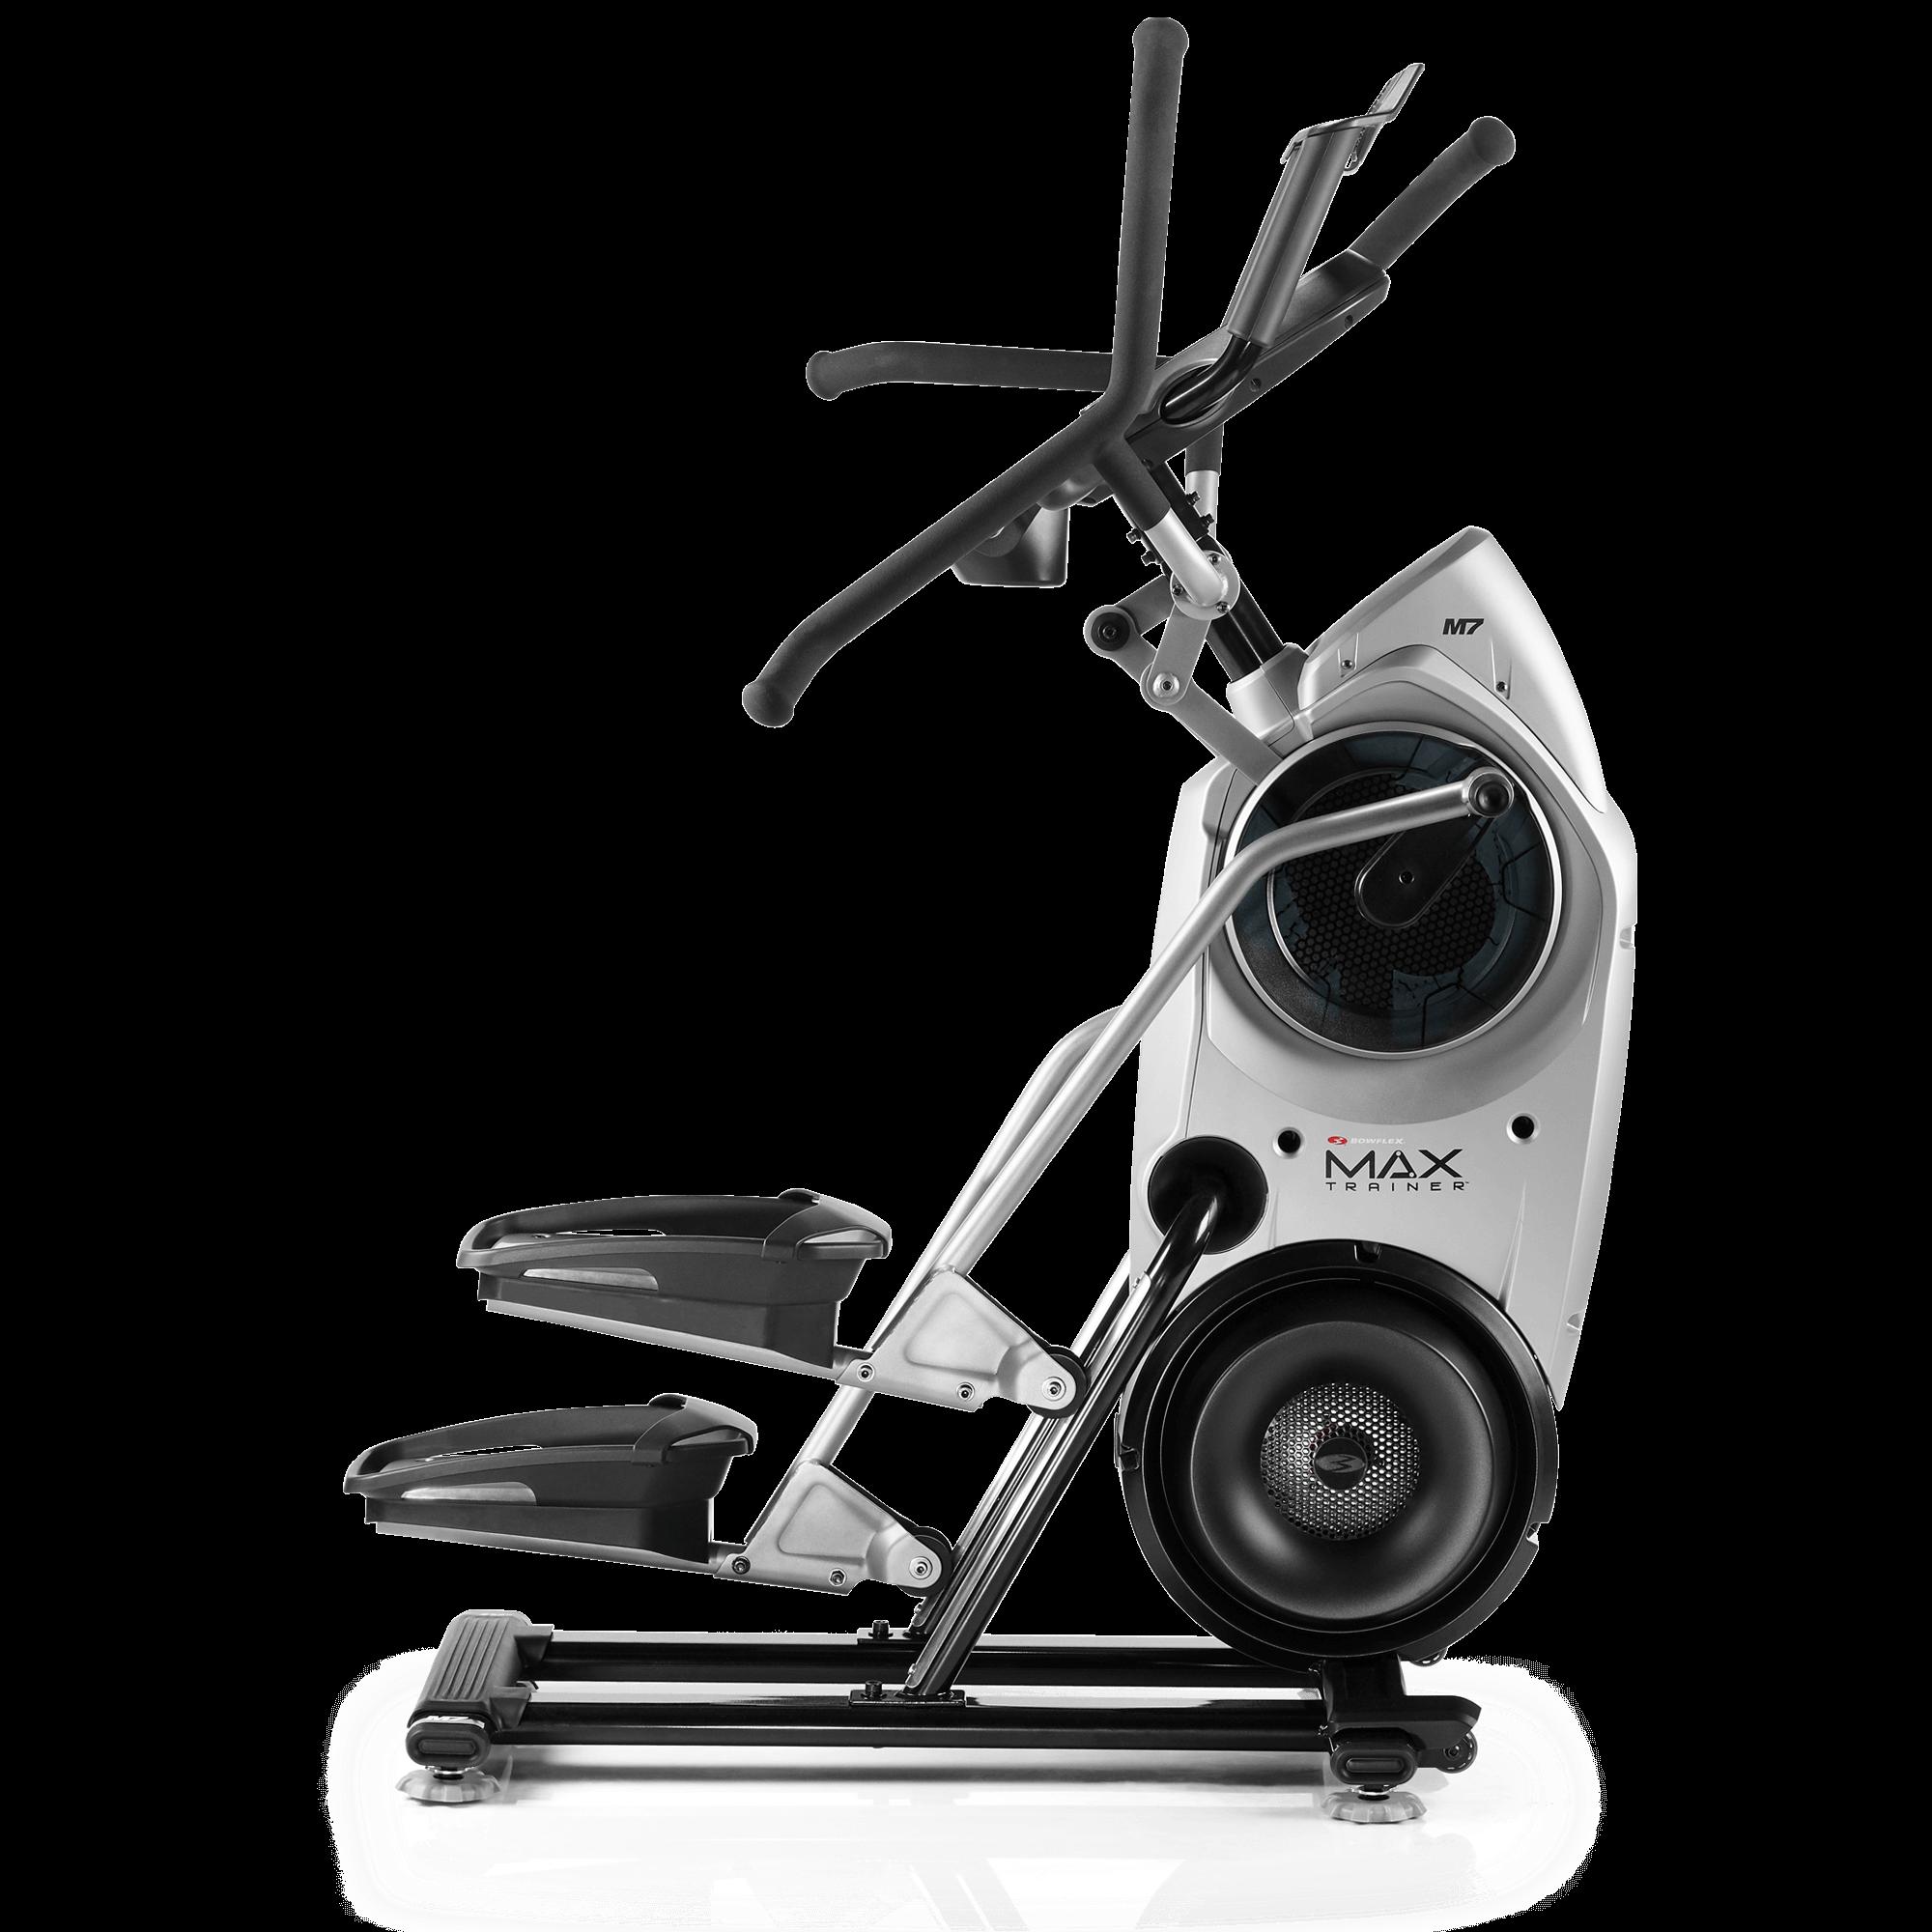 Bowflex Max Trainers Best Prices